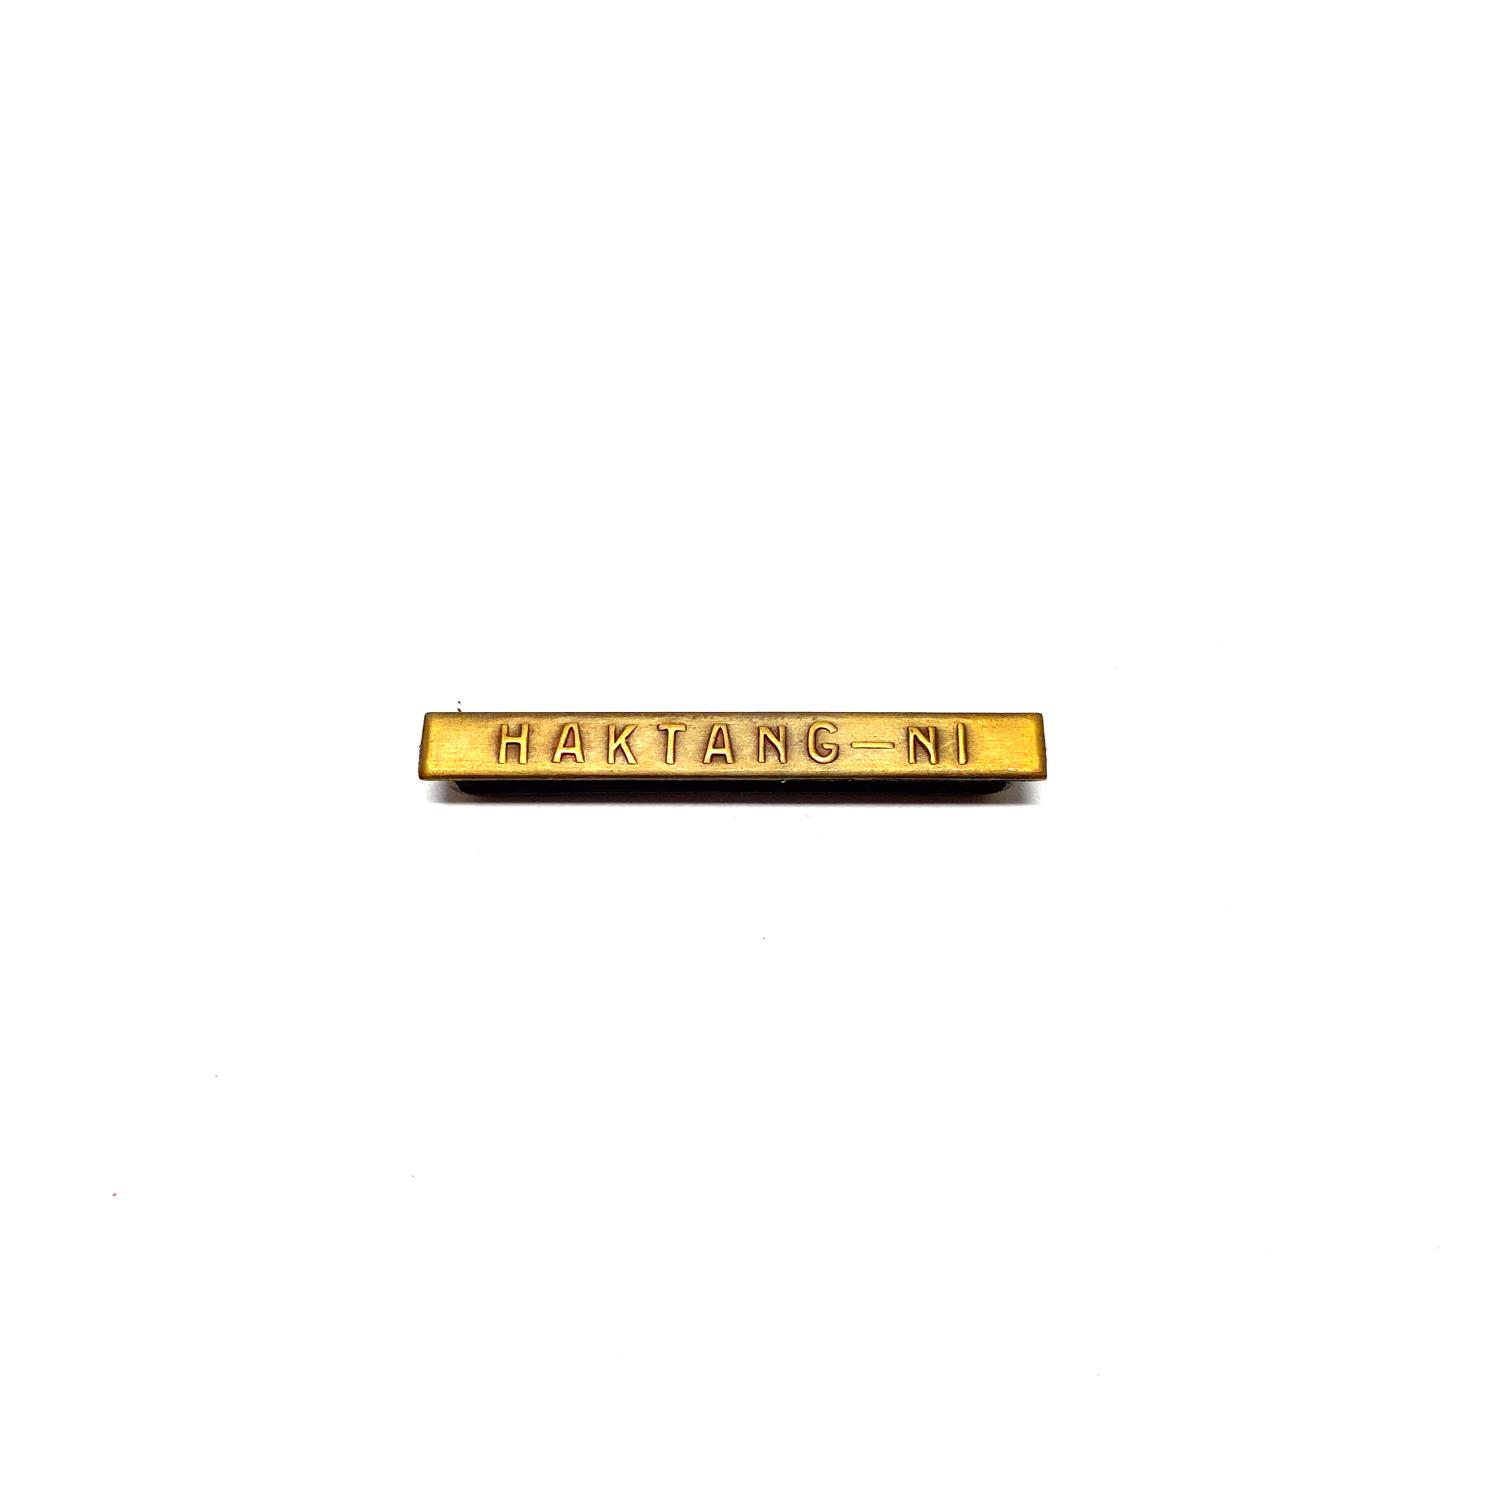 Bar Haktang-Ni for war medals